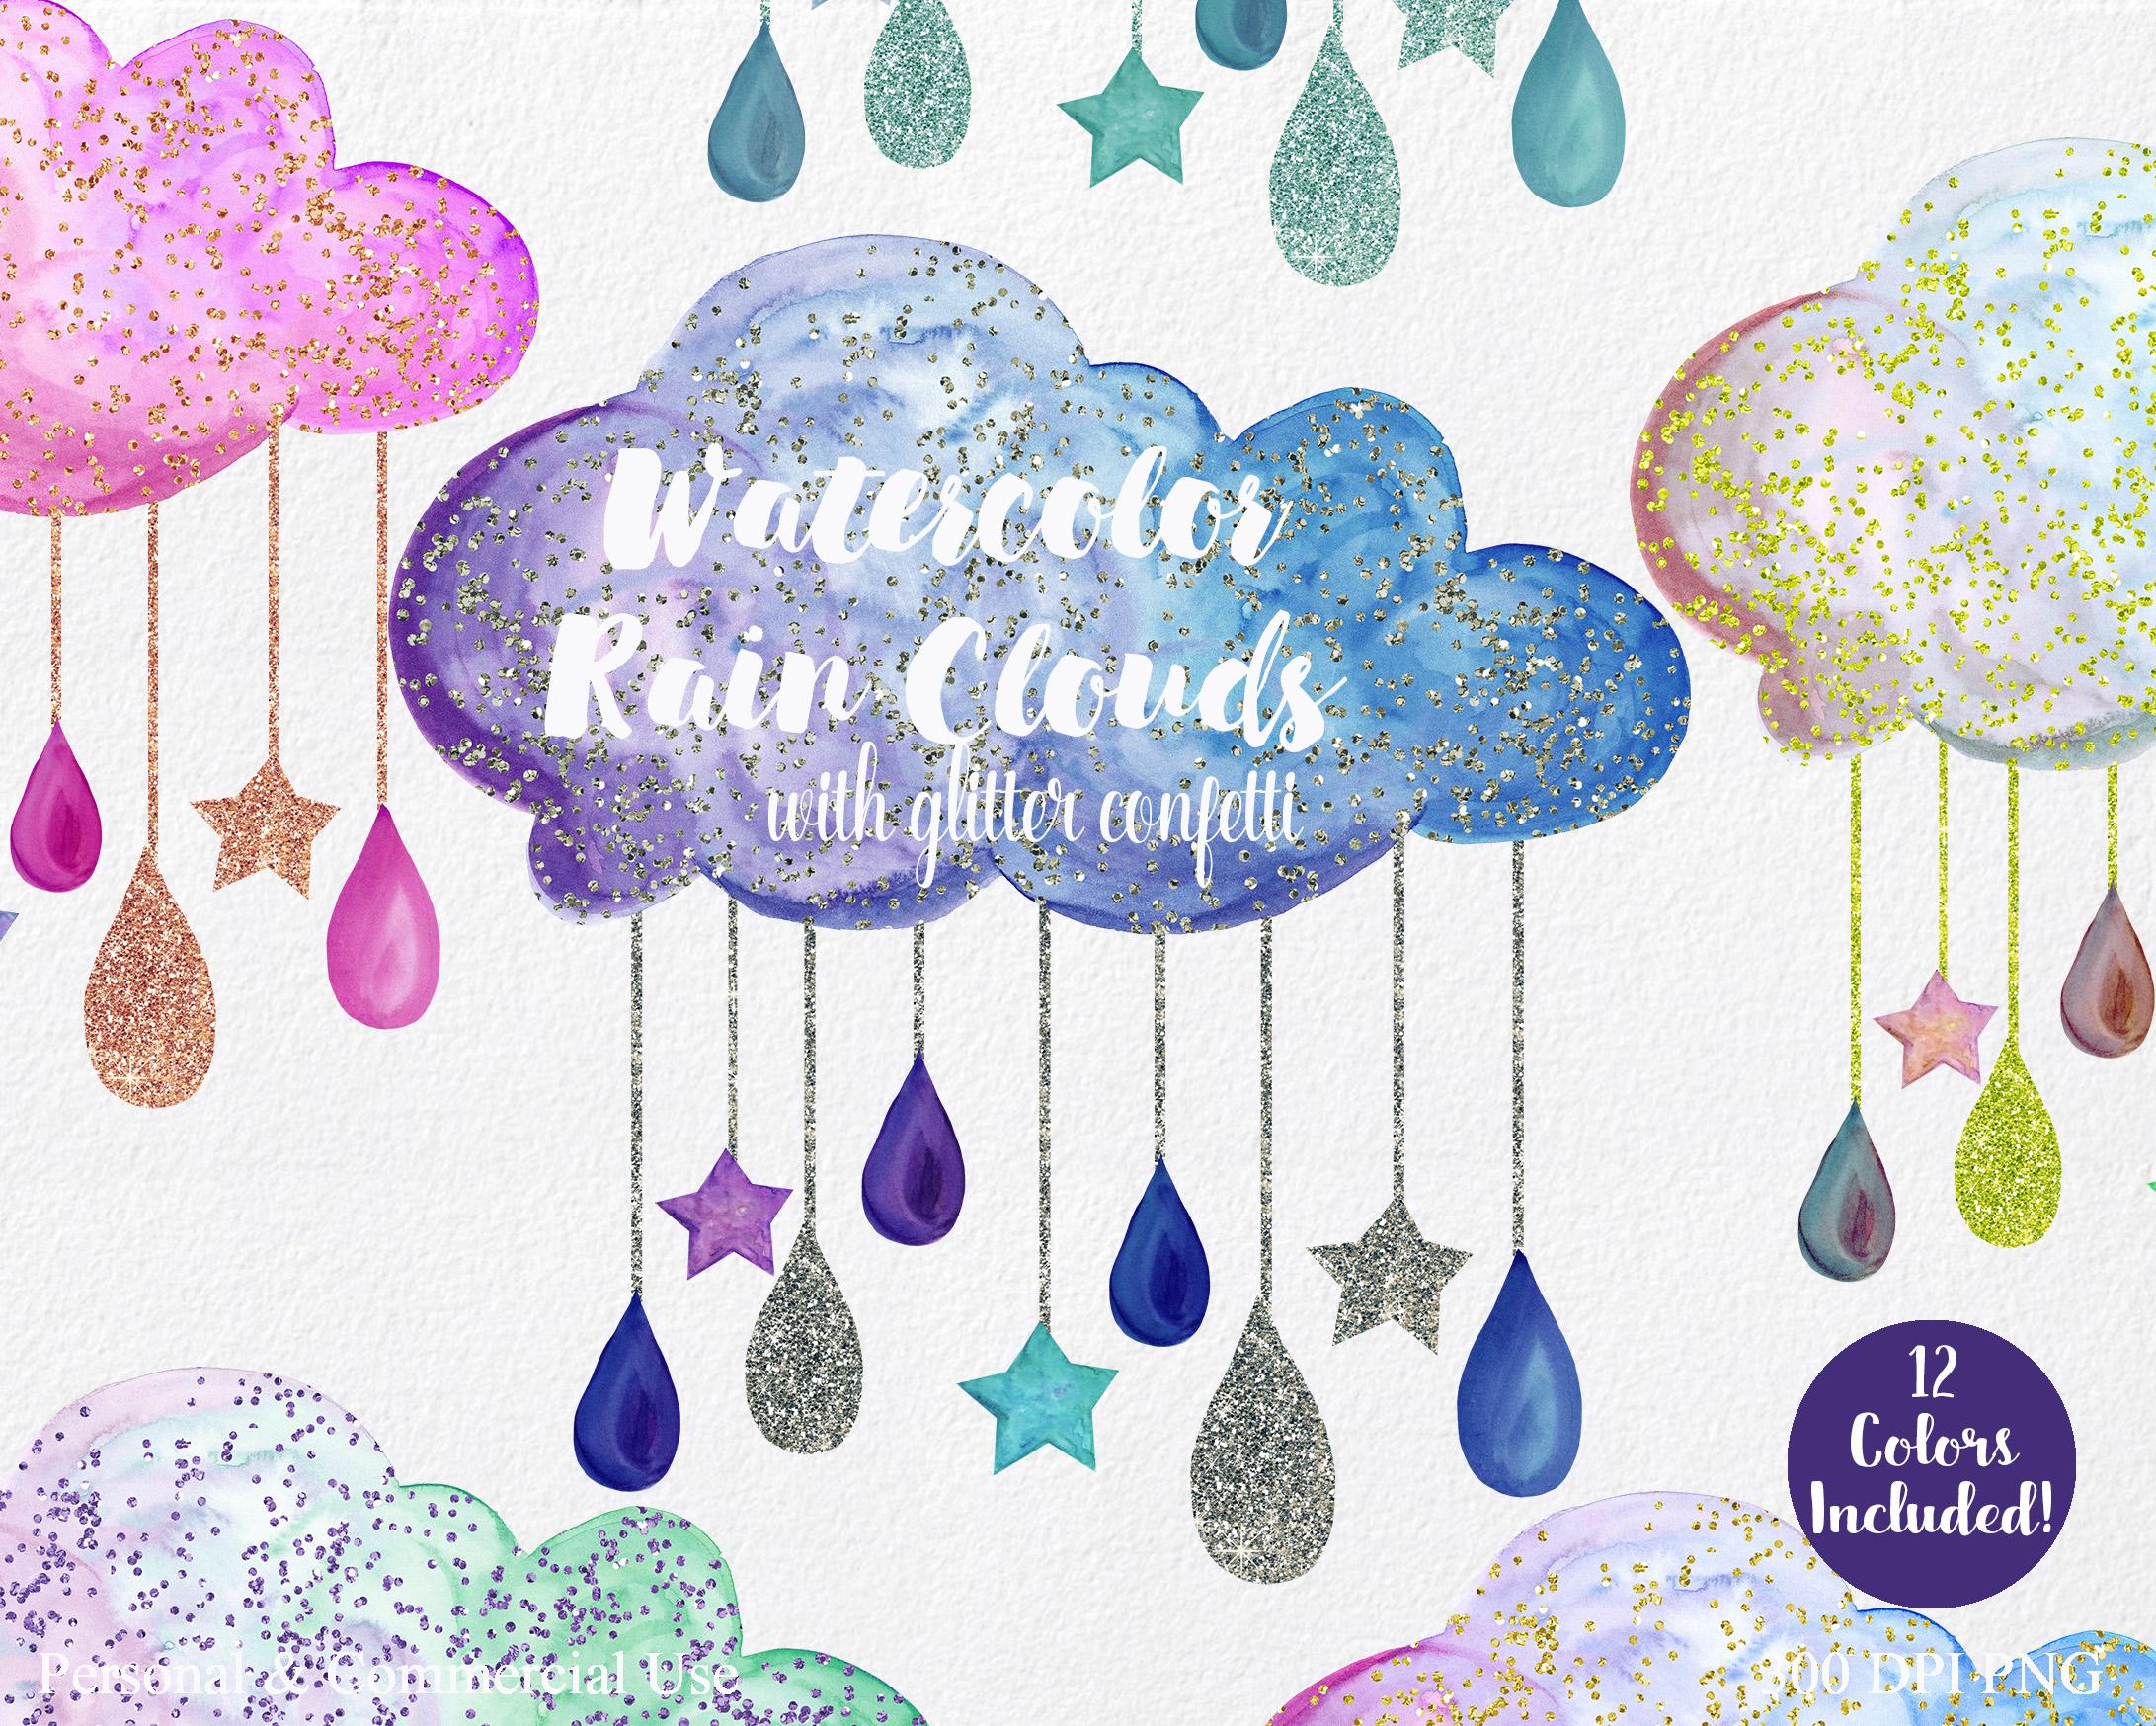 Cute Rainbow Watercolor Rain Clouds & Rain Drops with Metallic Gold Glitter Confetti Baby Shower Clipart Nursery Graphics Set example image 3